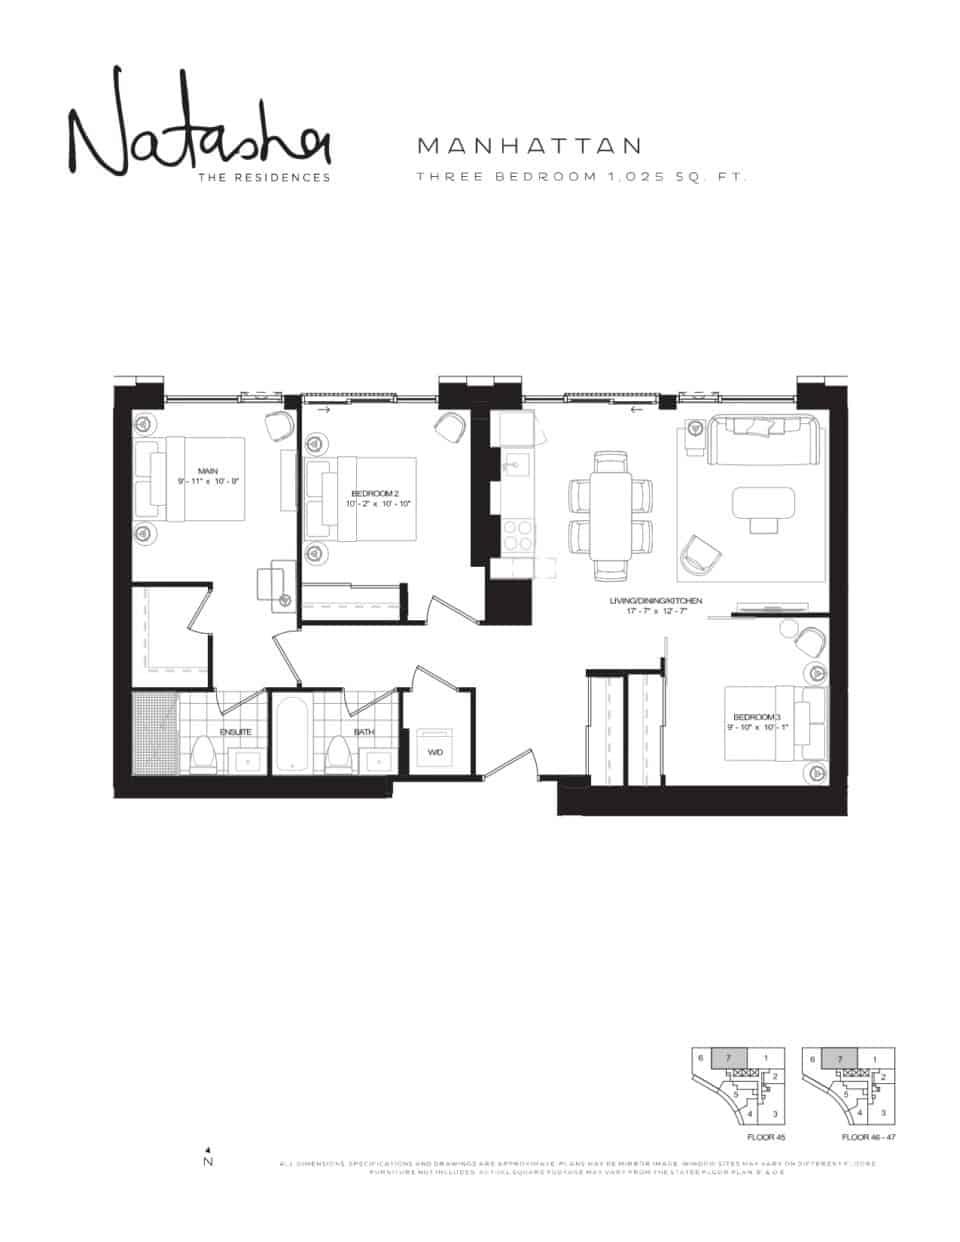 2021 09 02 11 02 31 natashatheresidences lanterradevelopments floorplans manhattan